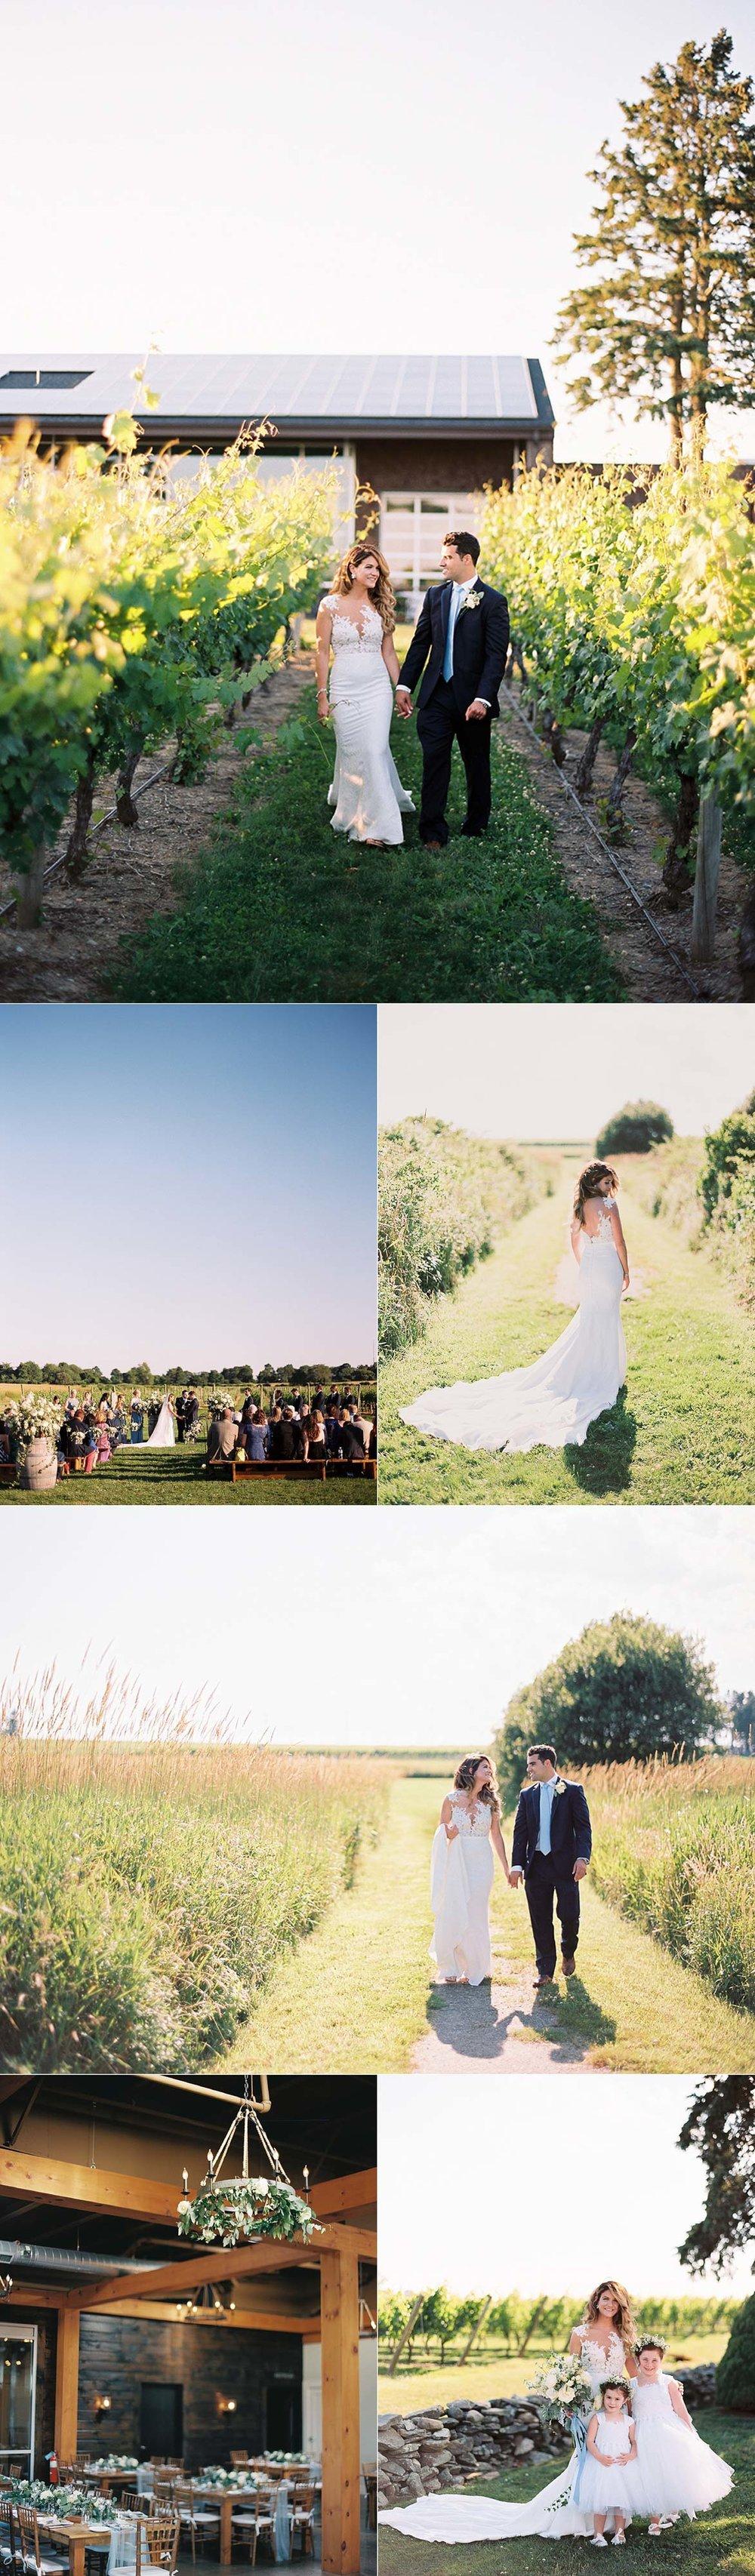 Newport Vineyards Wedding.-20.jpg